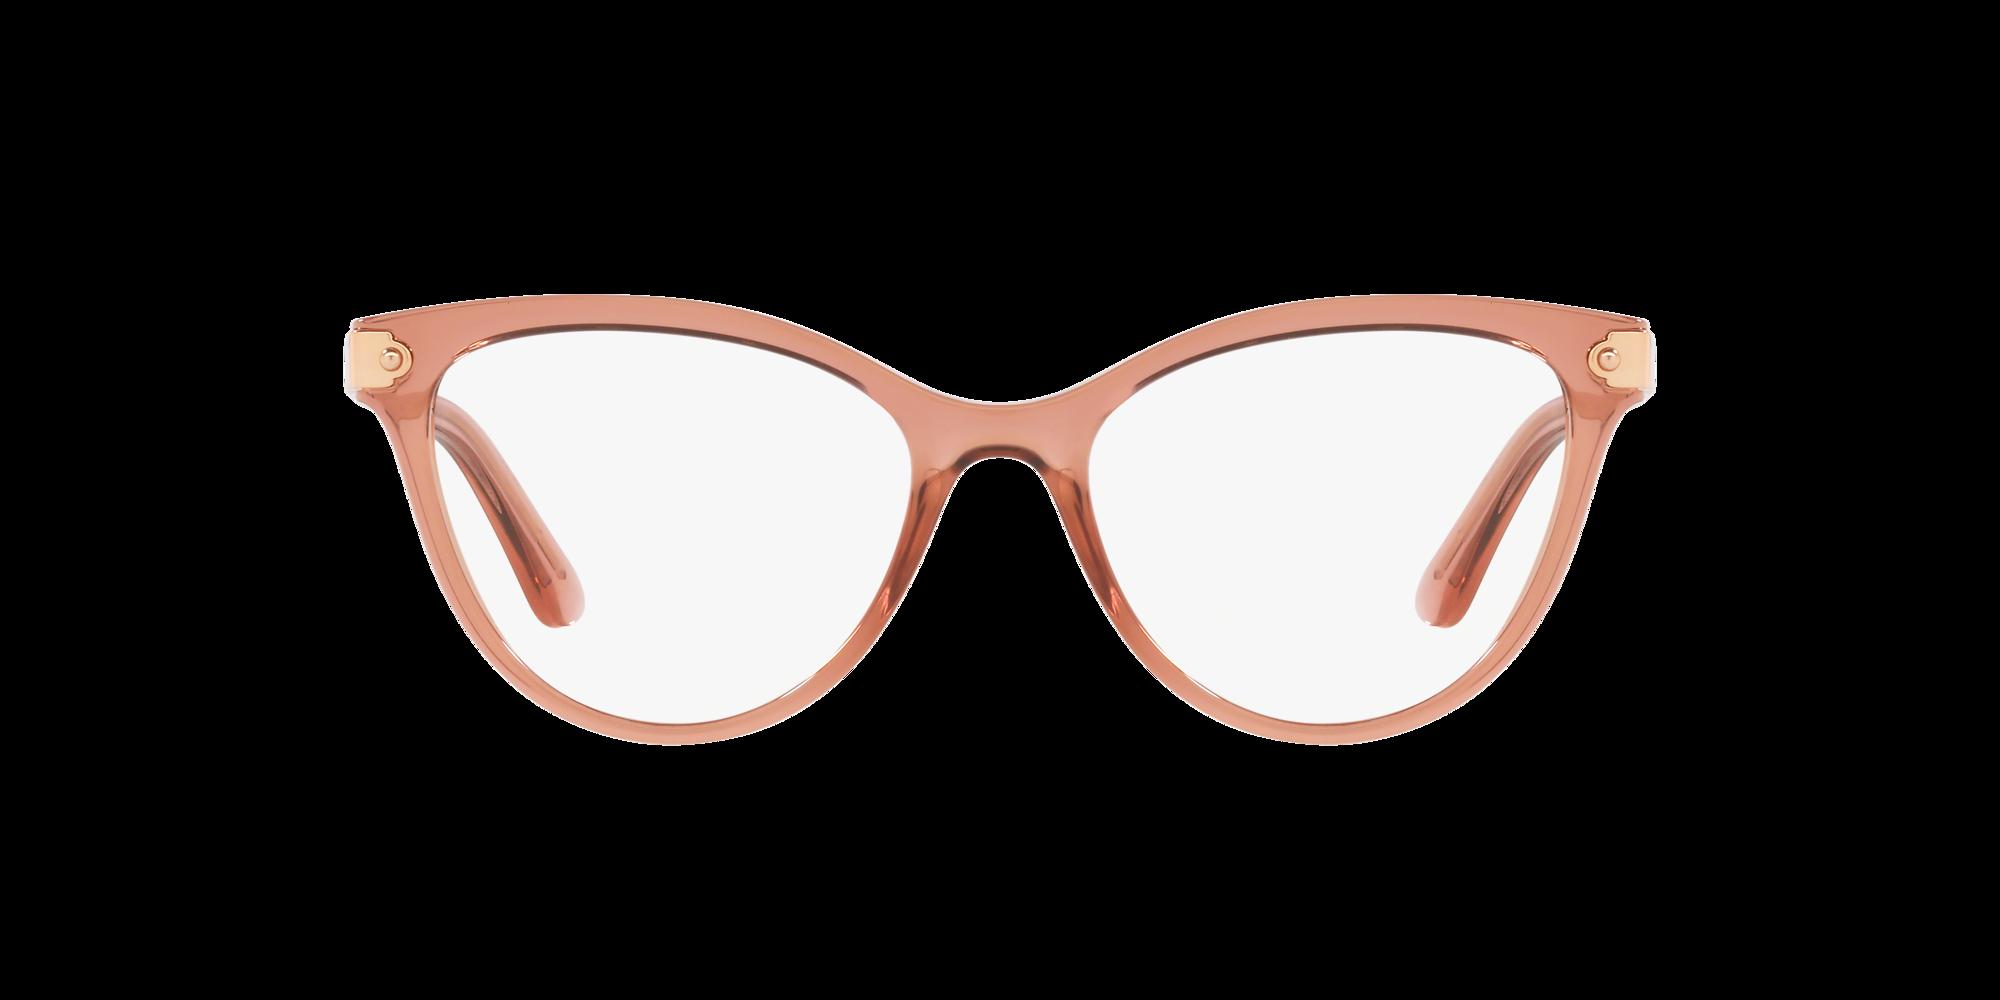 Image for DG5042 from LensCrafters | Glasses, Prescription Glasses Online, Eyewear